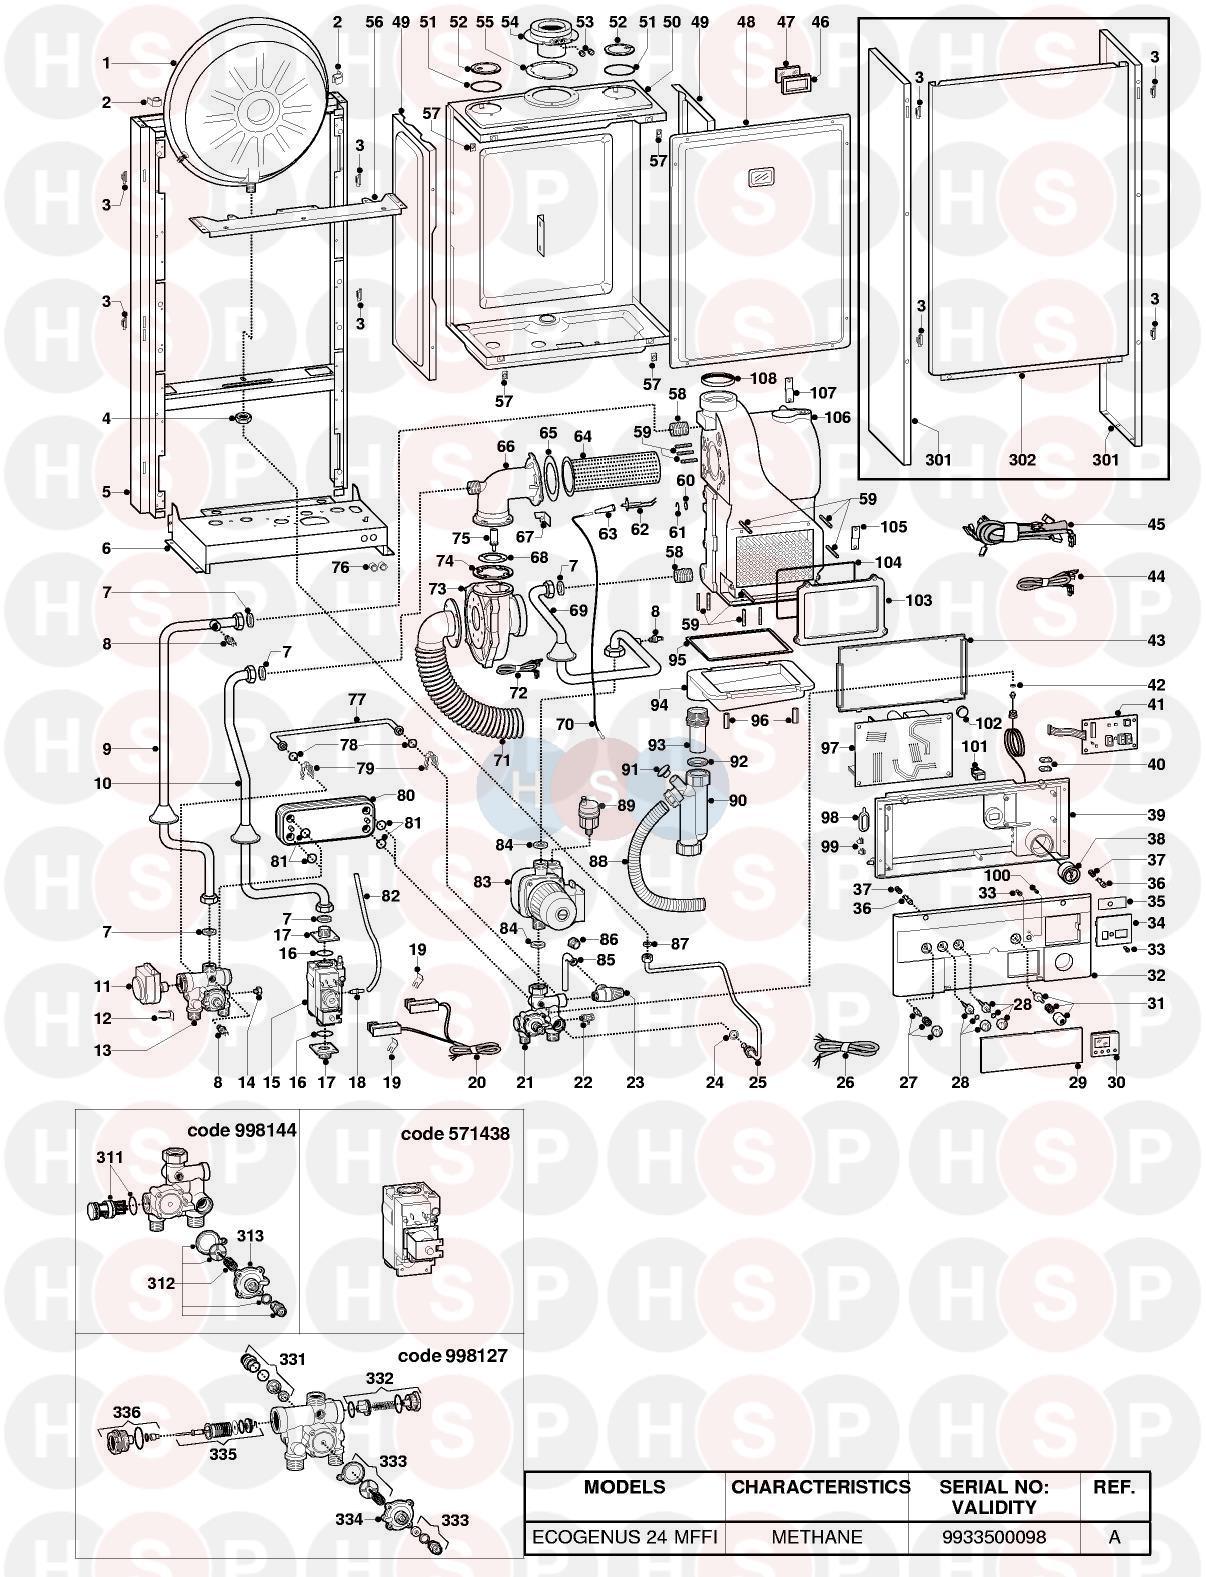 Ariston ECOGENUS 24 MFFI EDITION1 Appliance Diagram